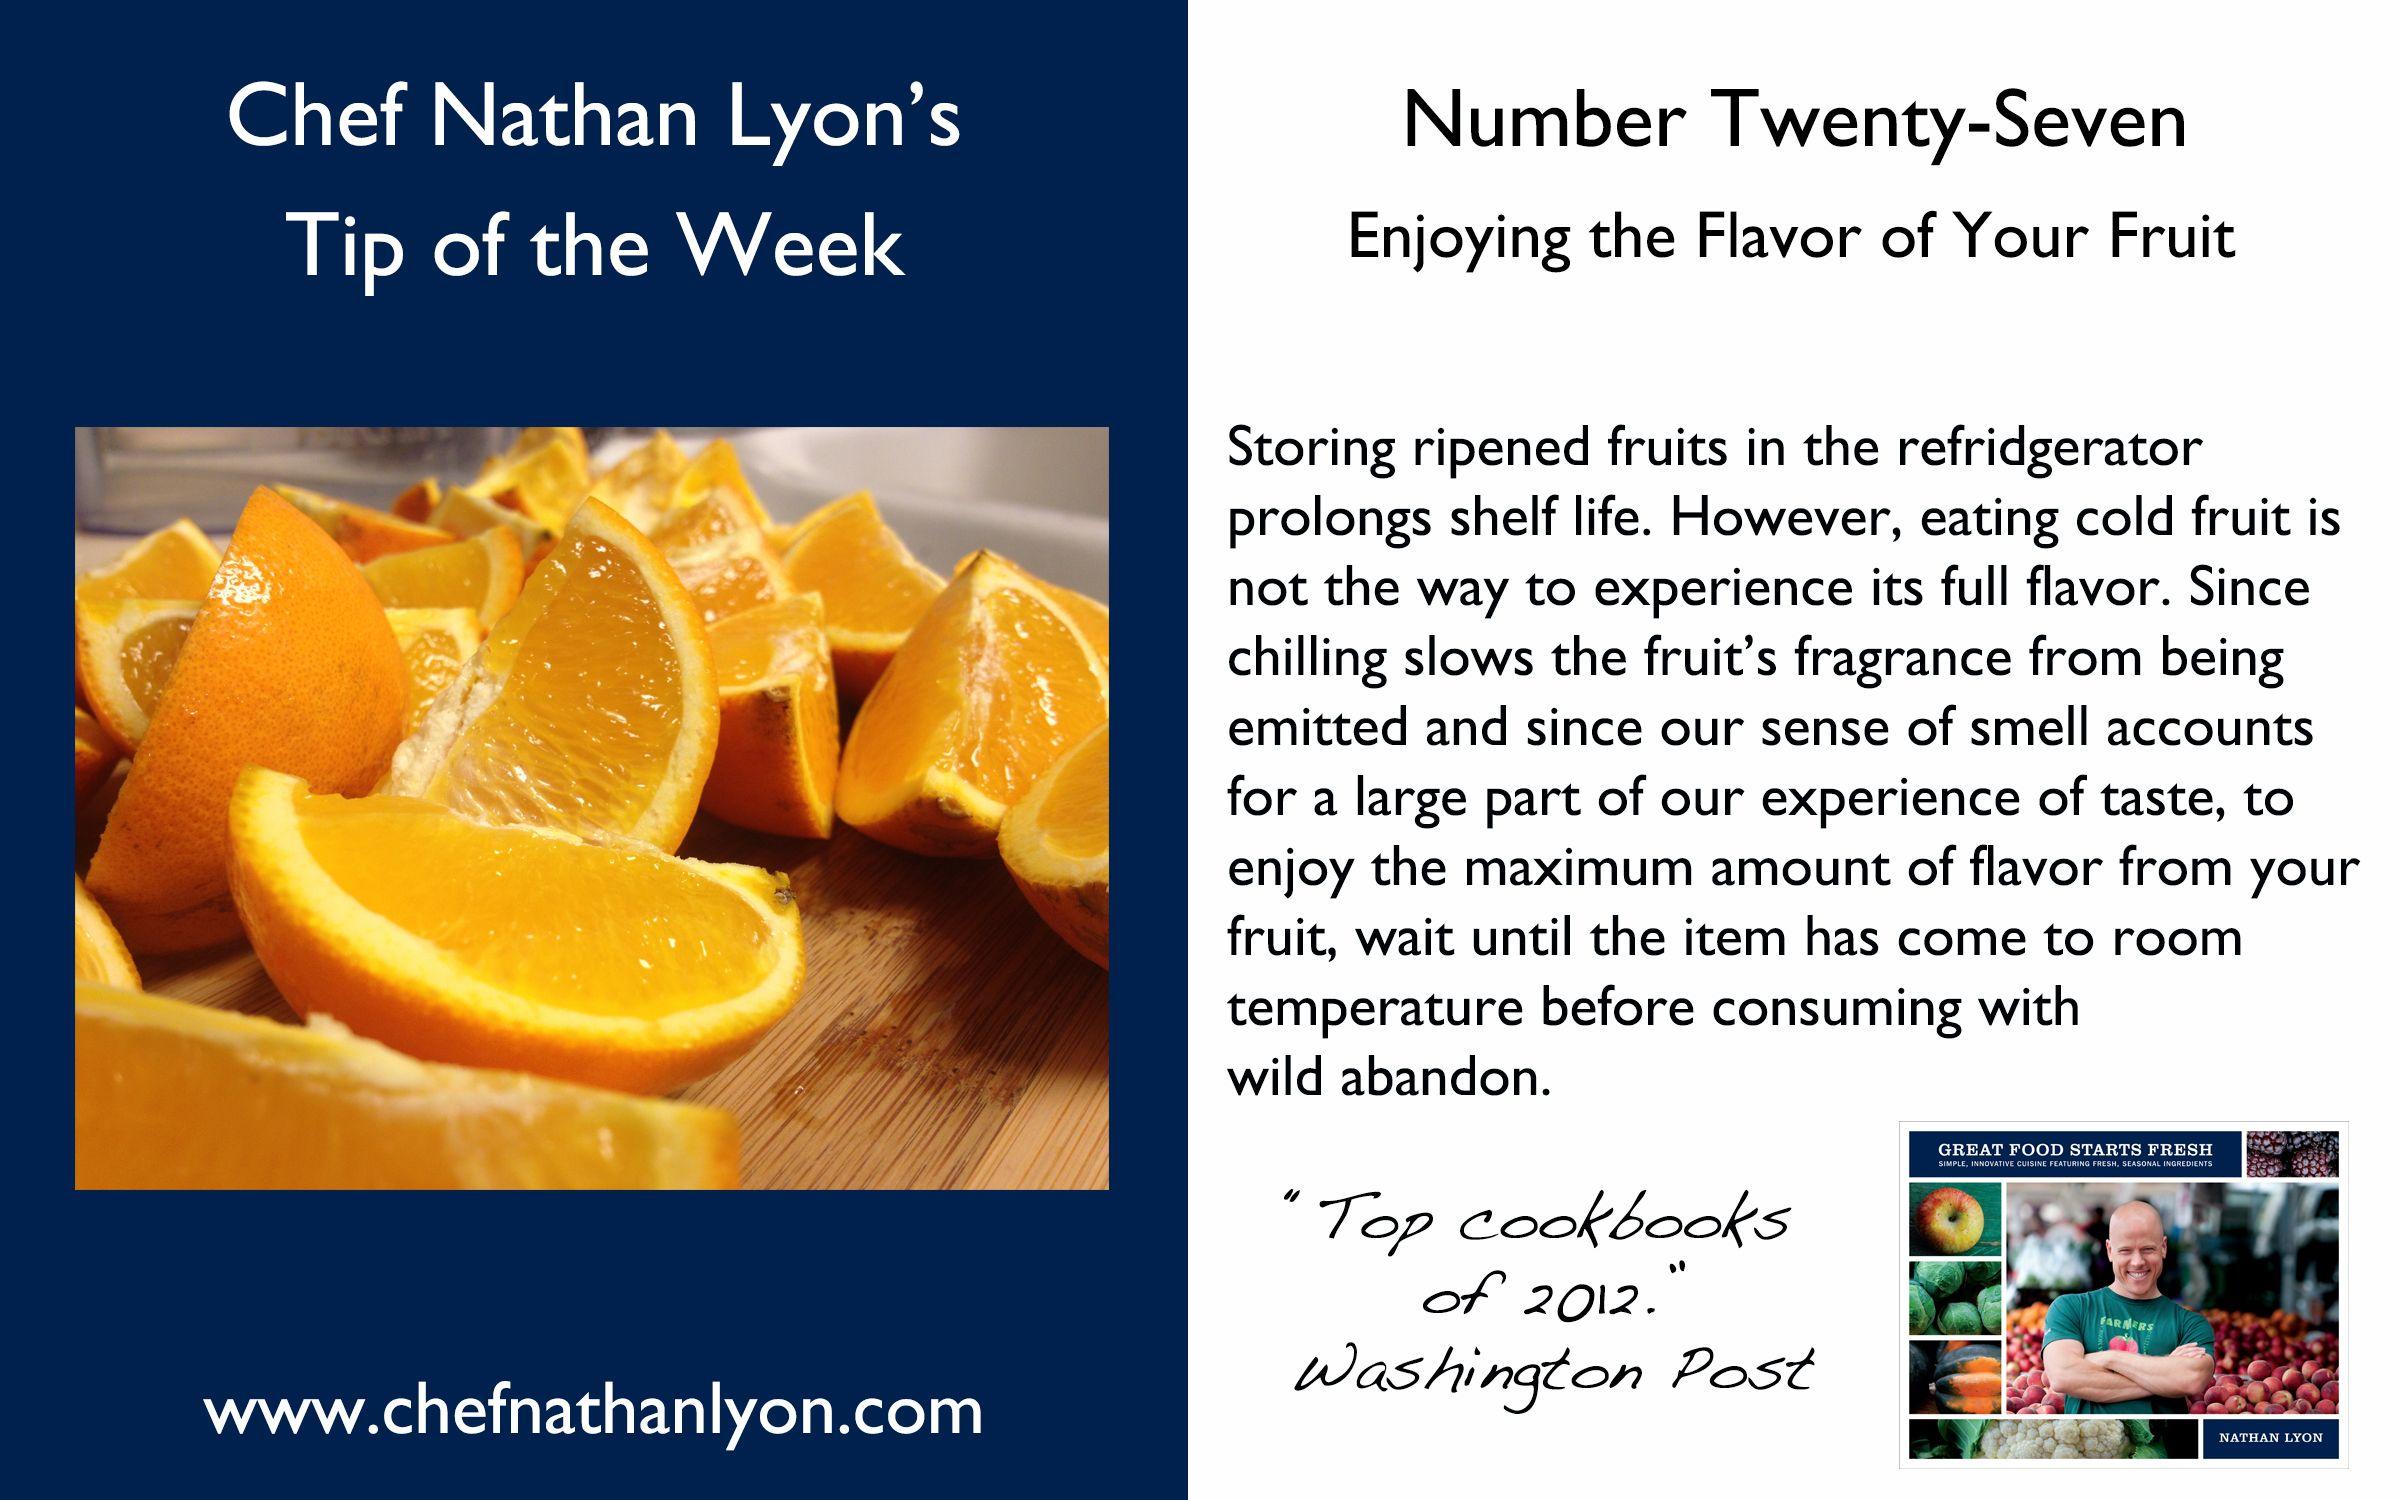 Weekly Tip Number Twenty-Seven